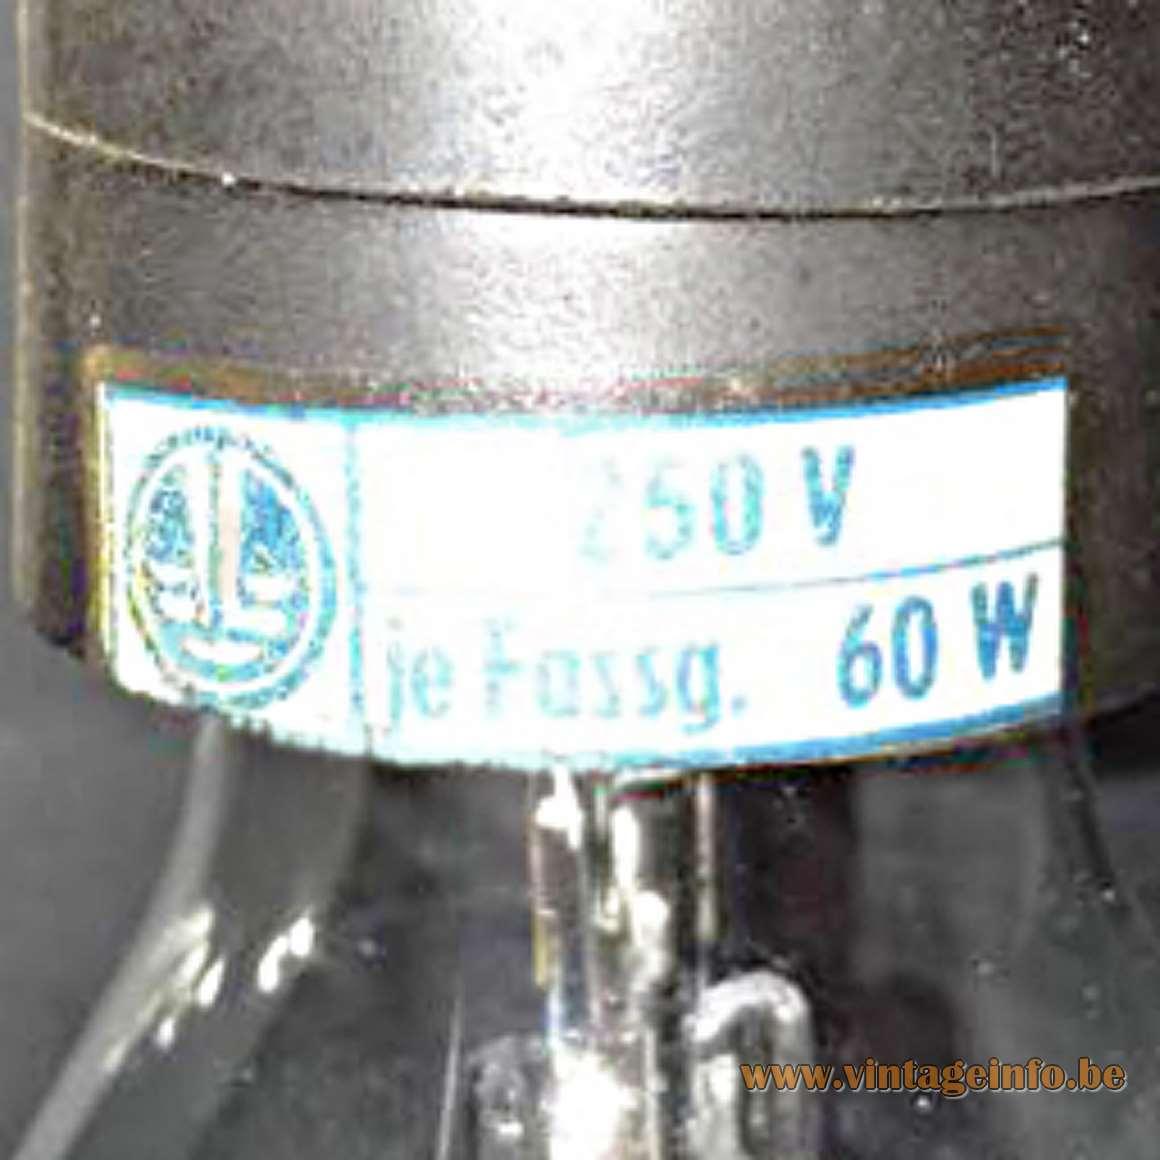 1960s Desk Lamps - socket + label